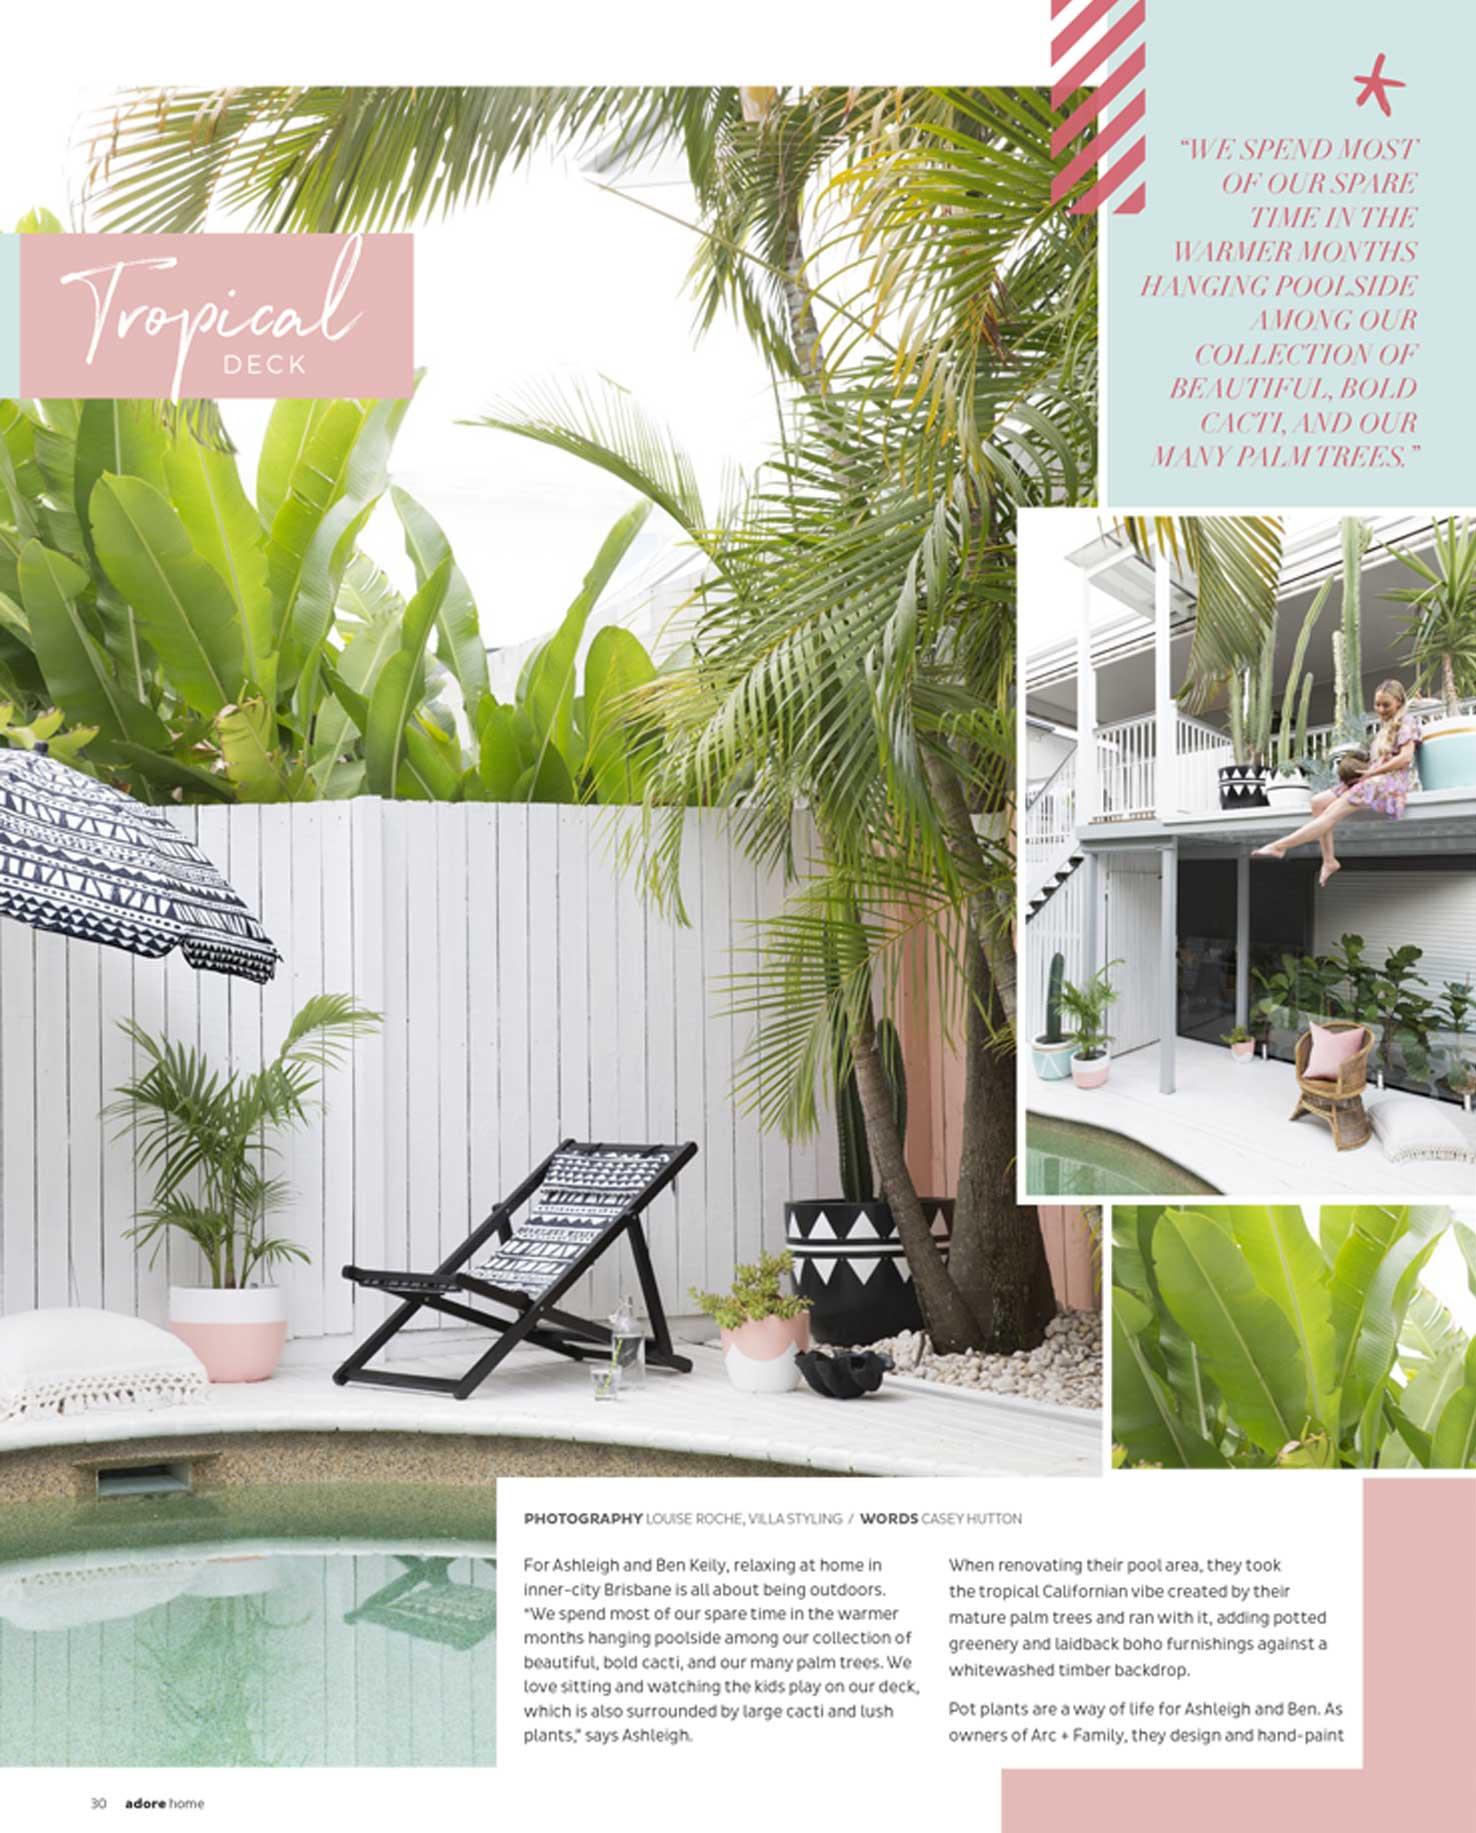 Blog_Lifestyle_AdoreMag17_TropicalDeck_02